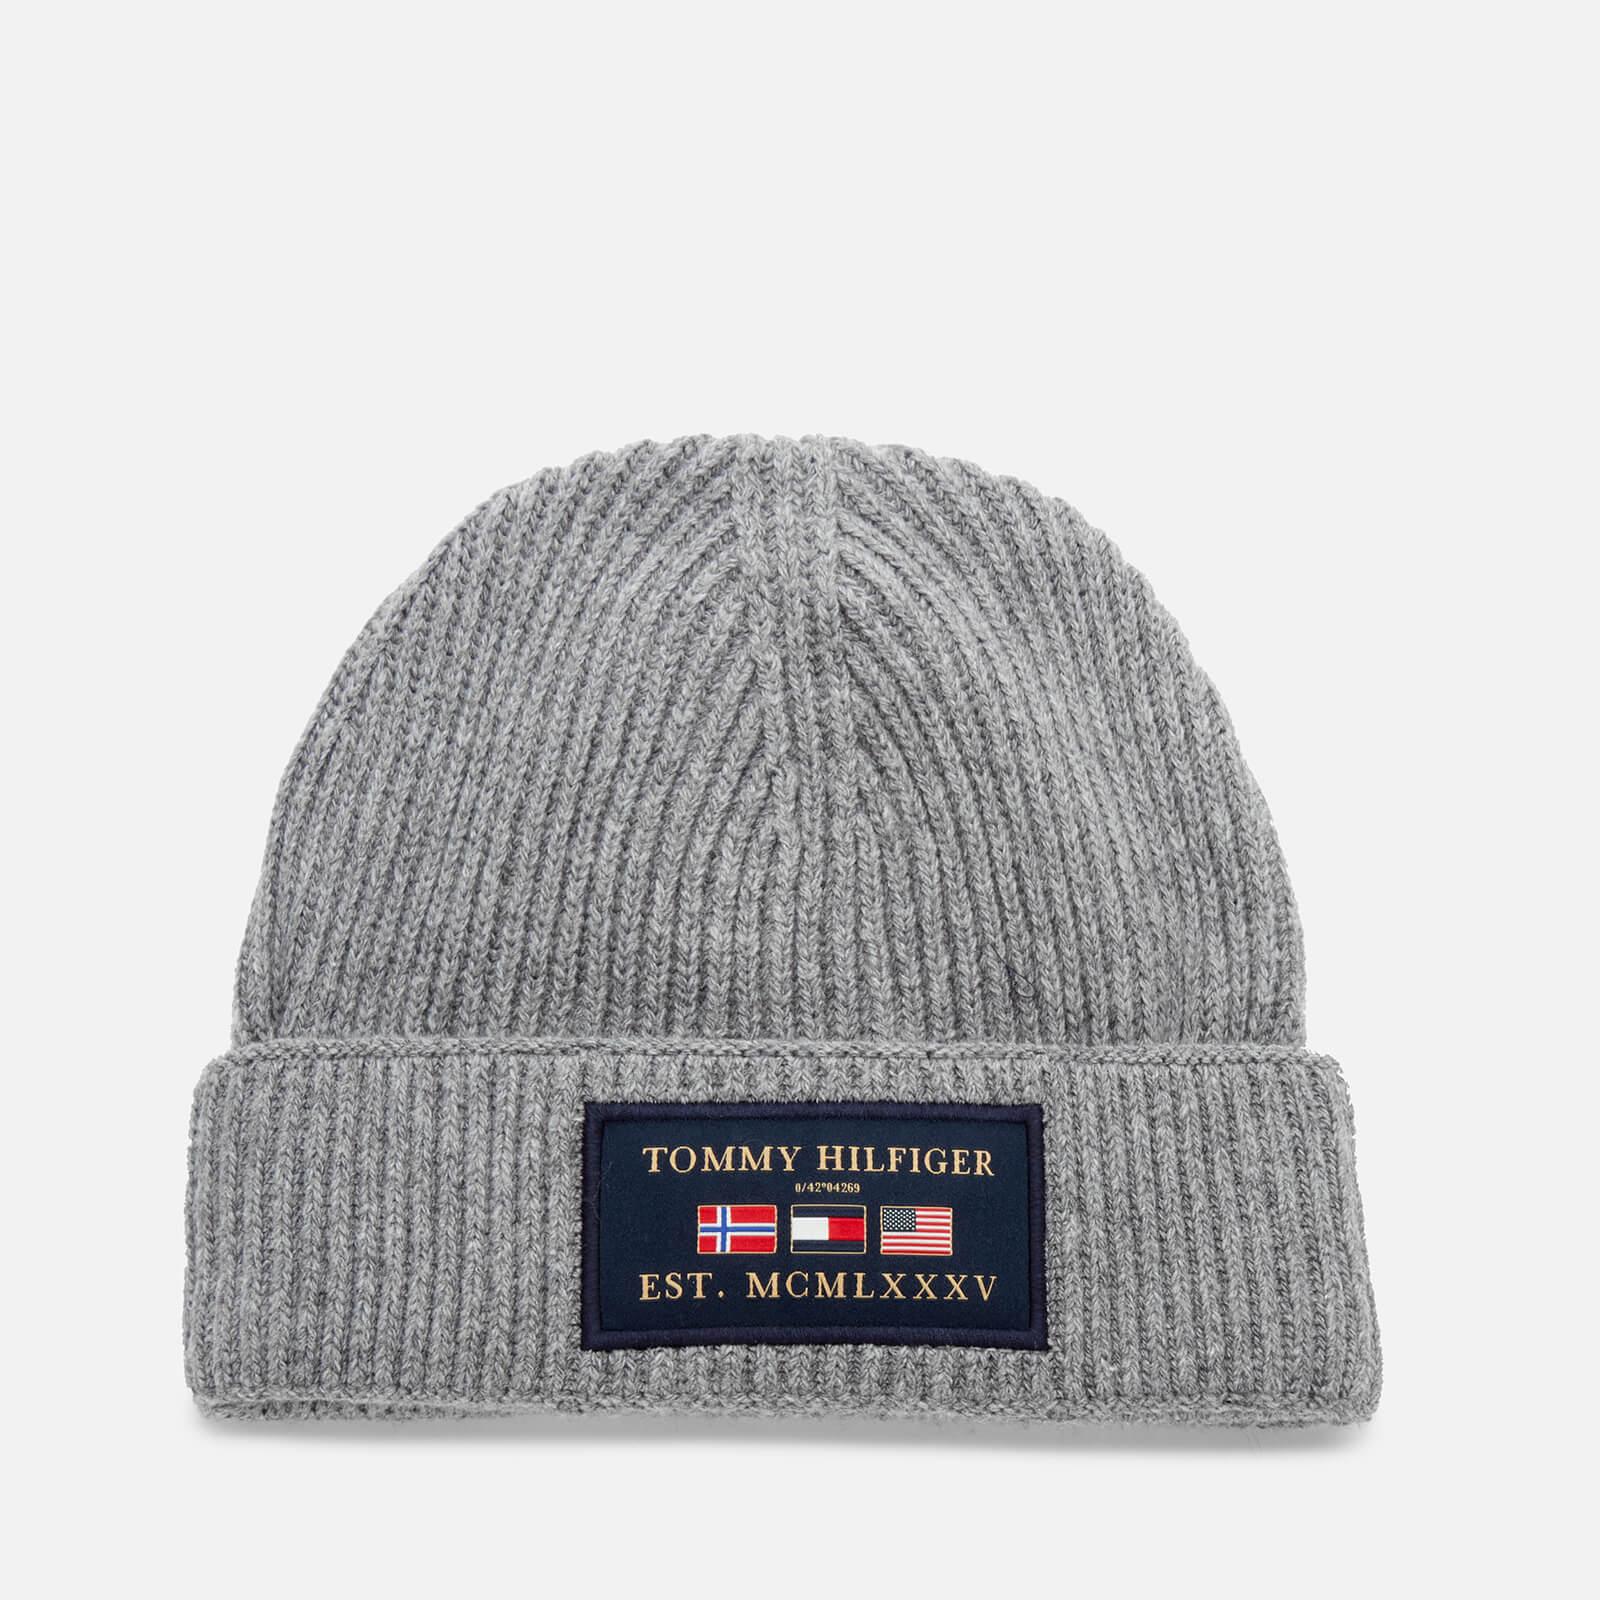 Tommy Hilfiger Men's Outdoors Patch Beanie Hat - Mid Grey Melange